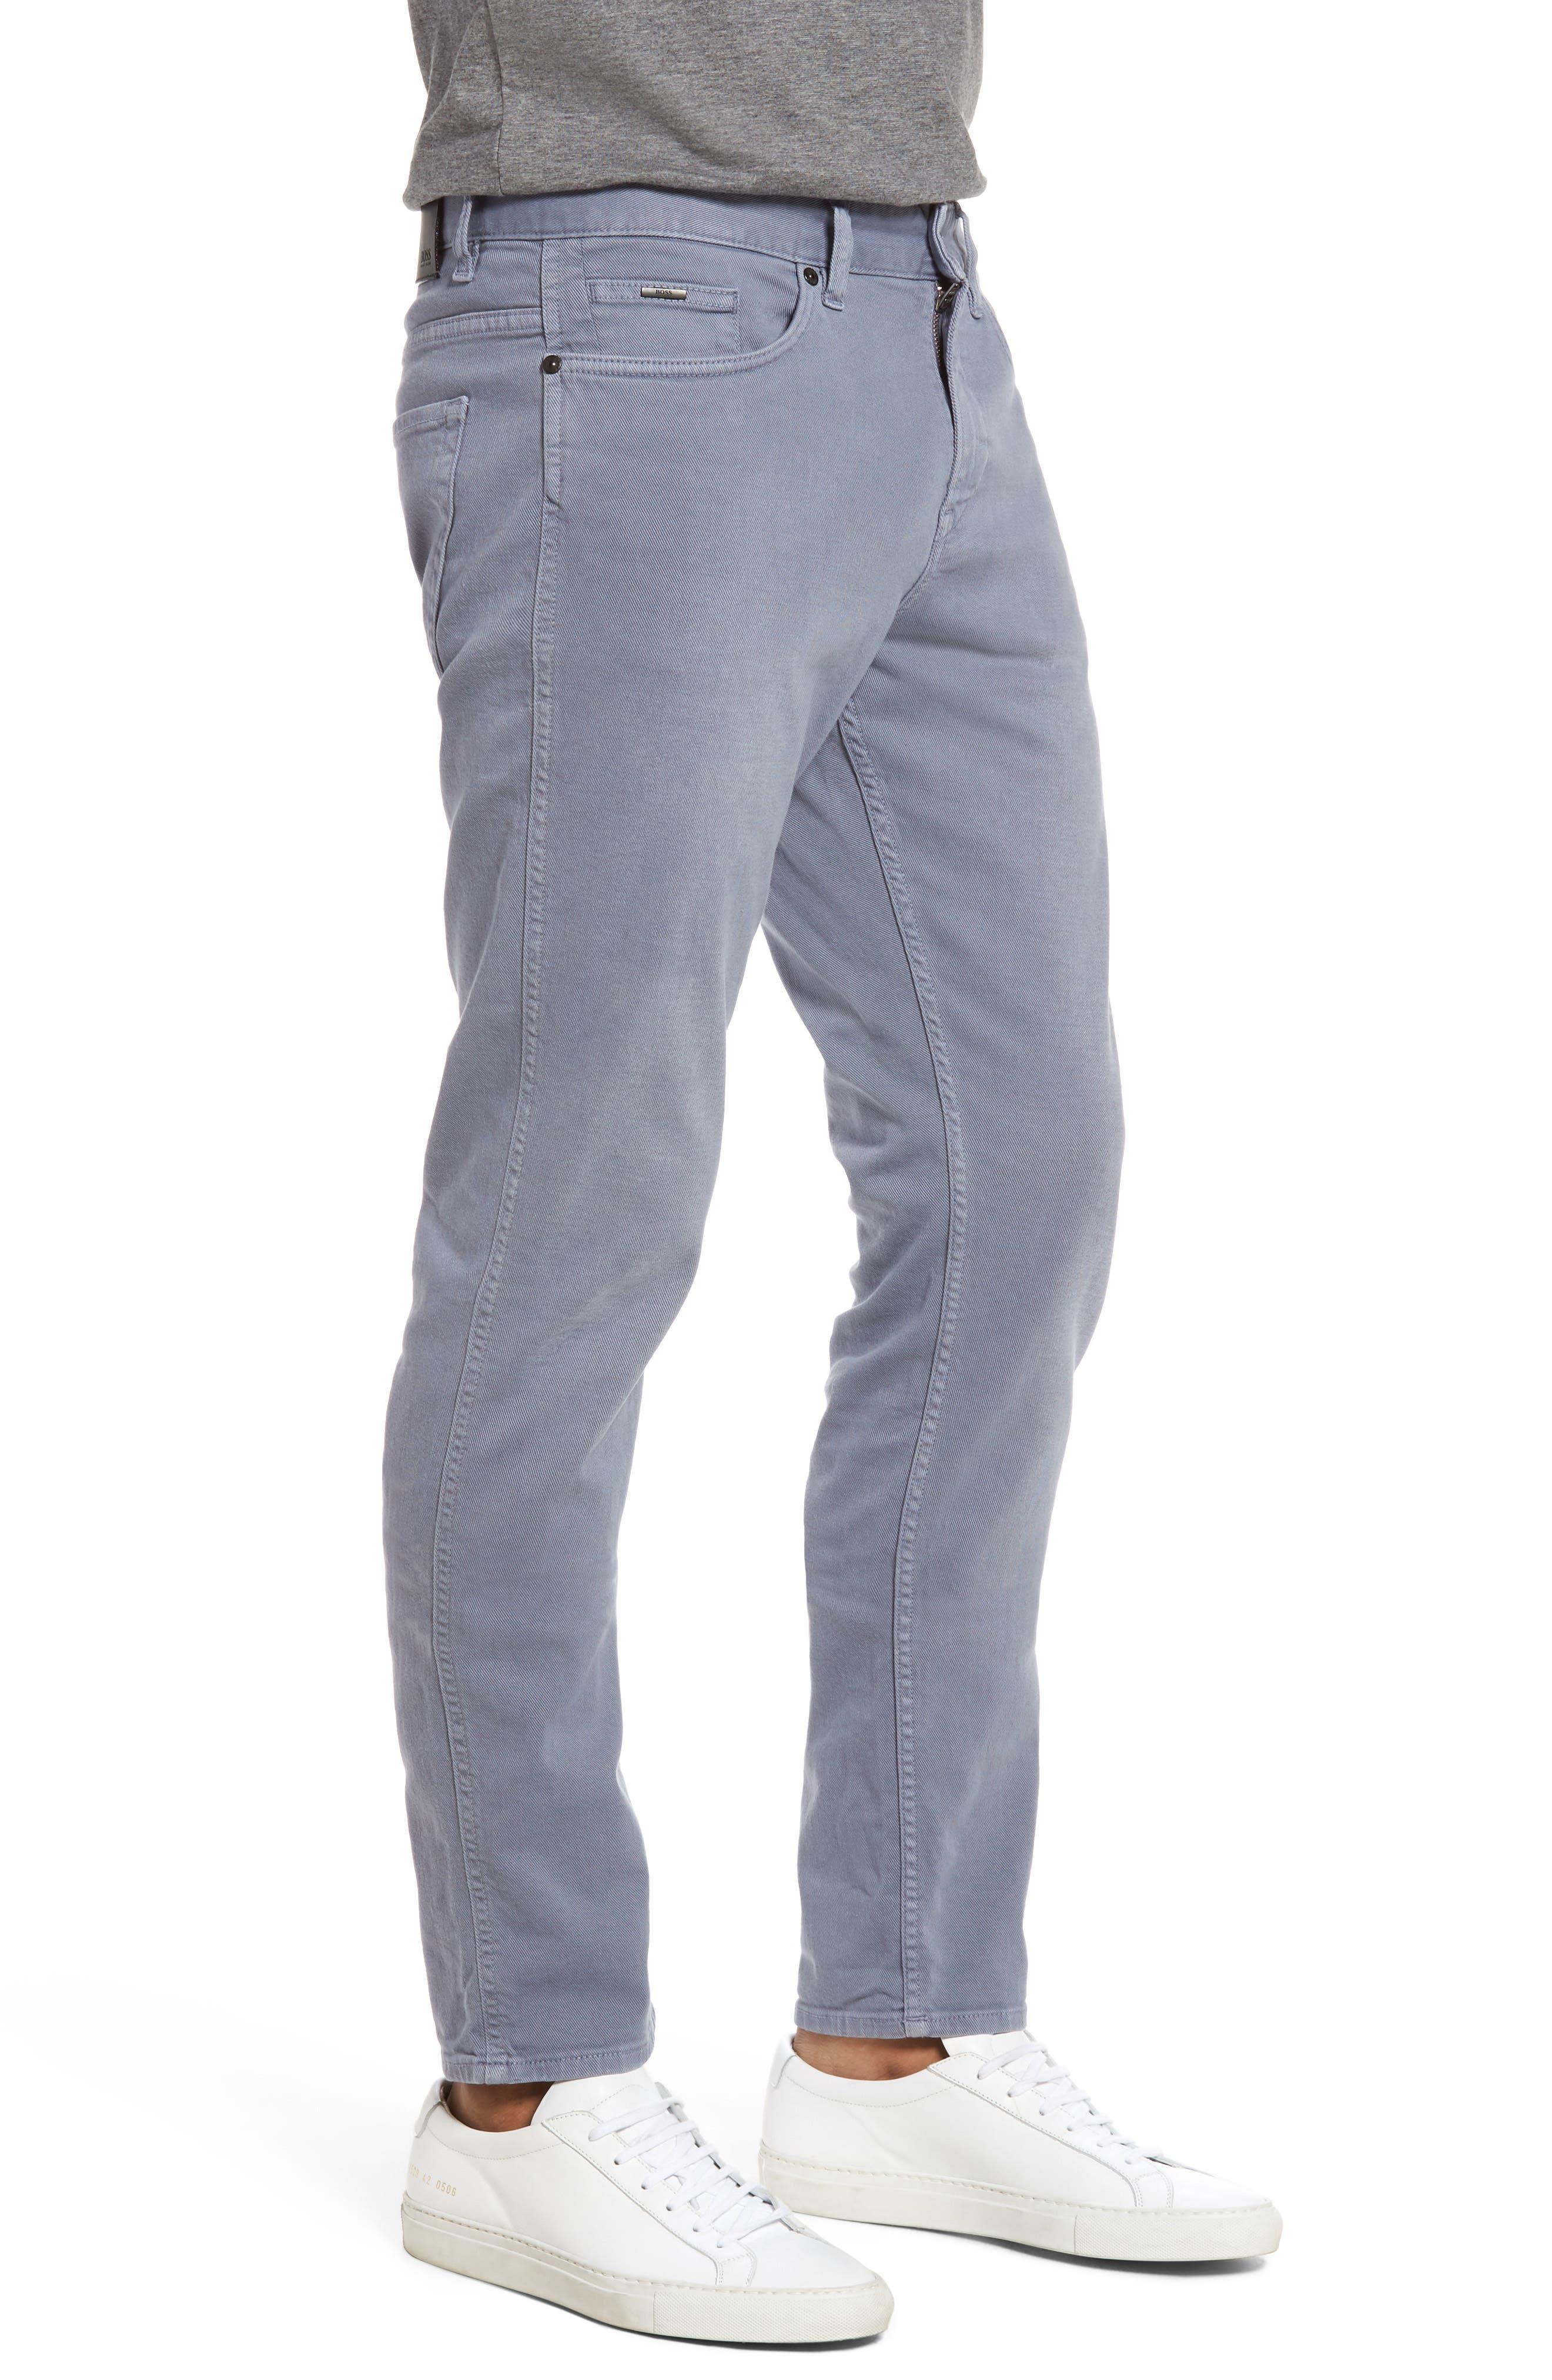 Delaware Slim Fit Jeans,                             Alternate thumbnail 3, color,                             462